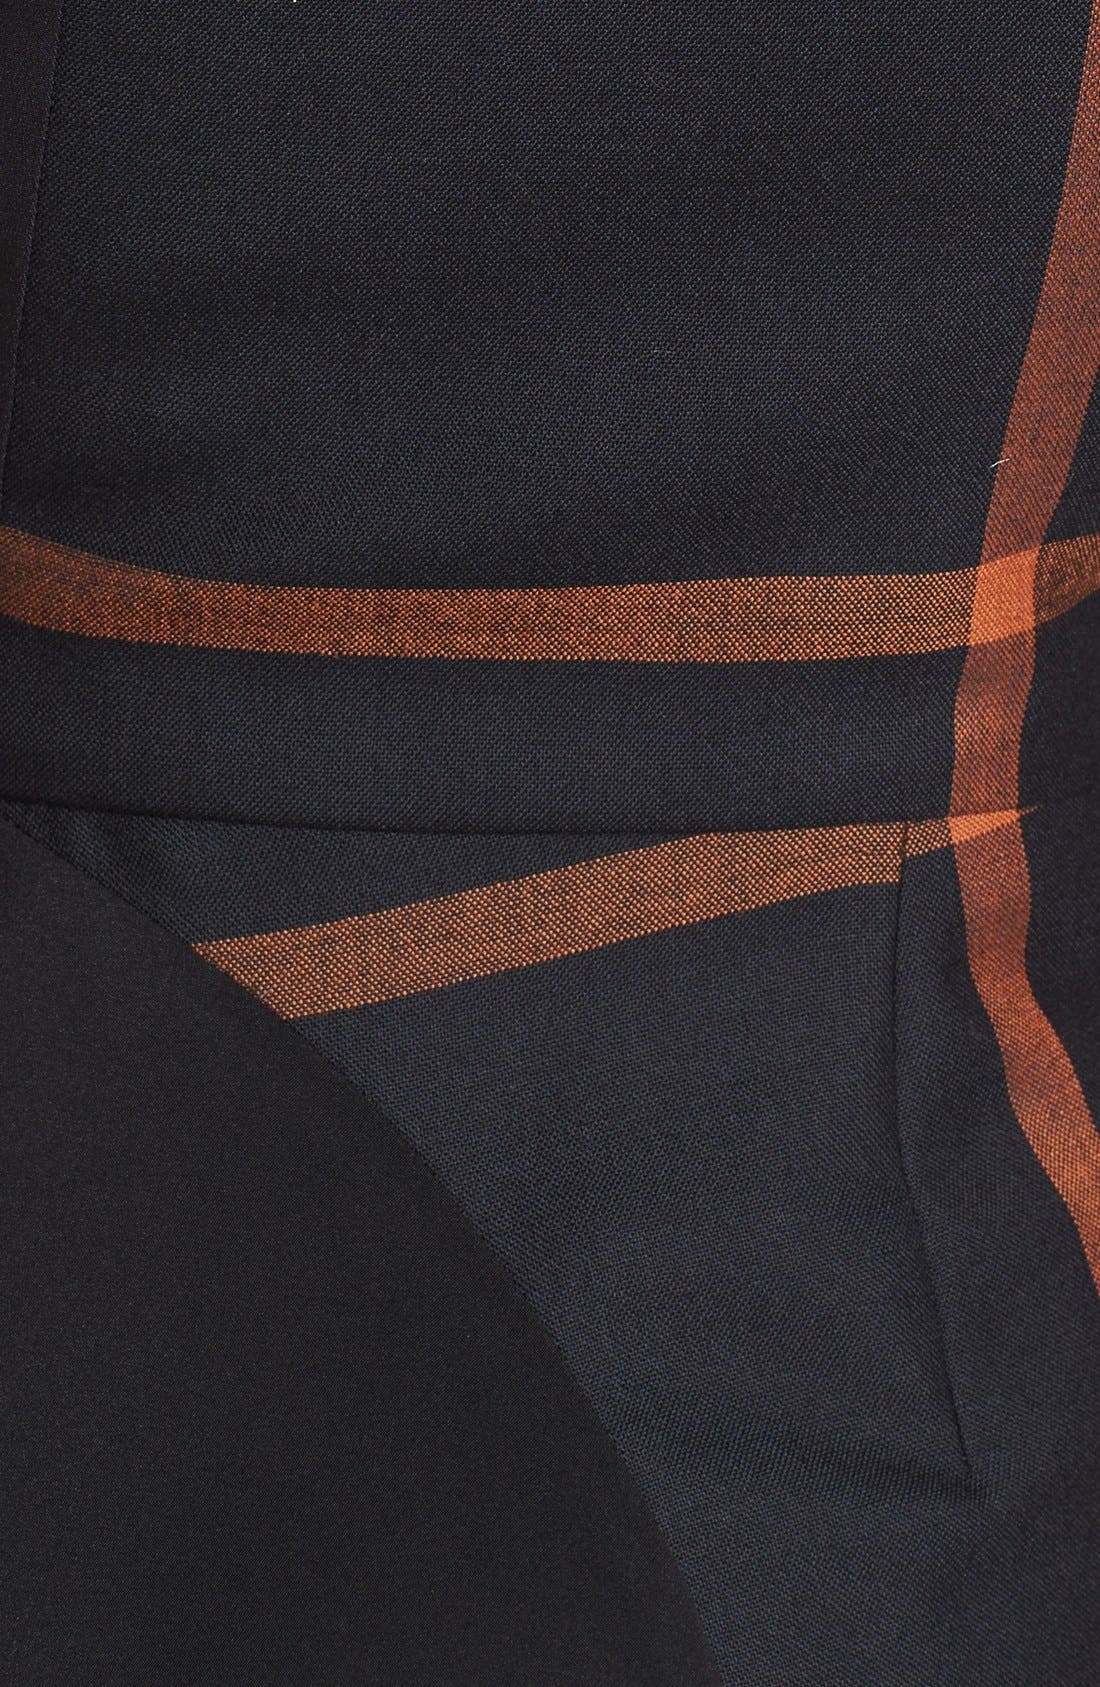 Alternate Image 4  - 3.1 Phillip Lim 'Shadow' Satin Inset Dress